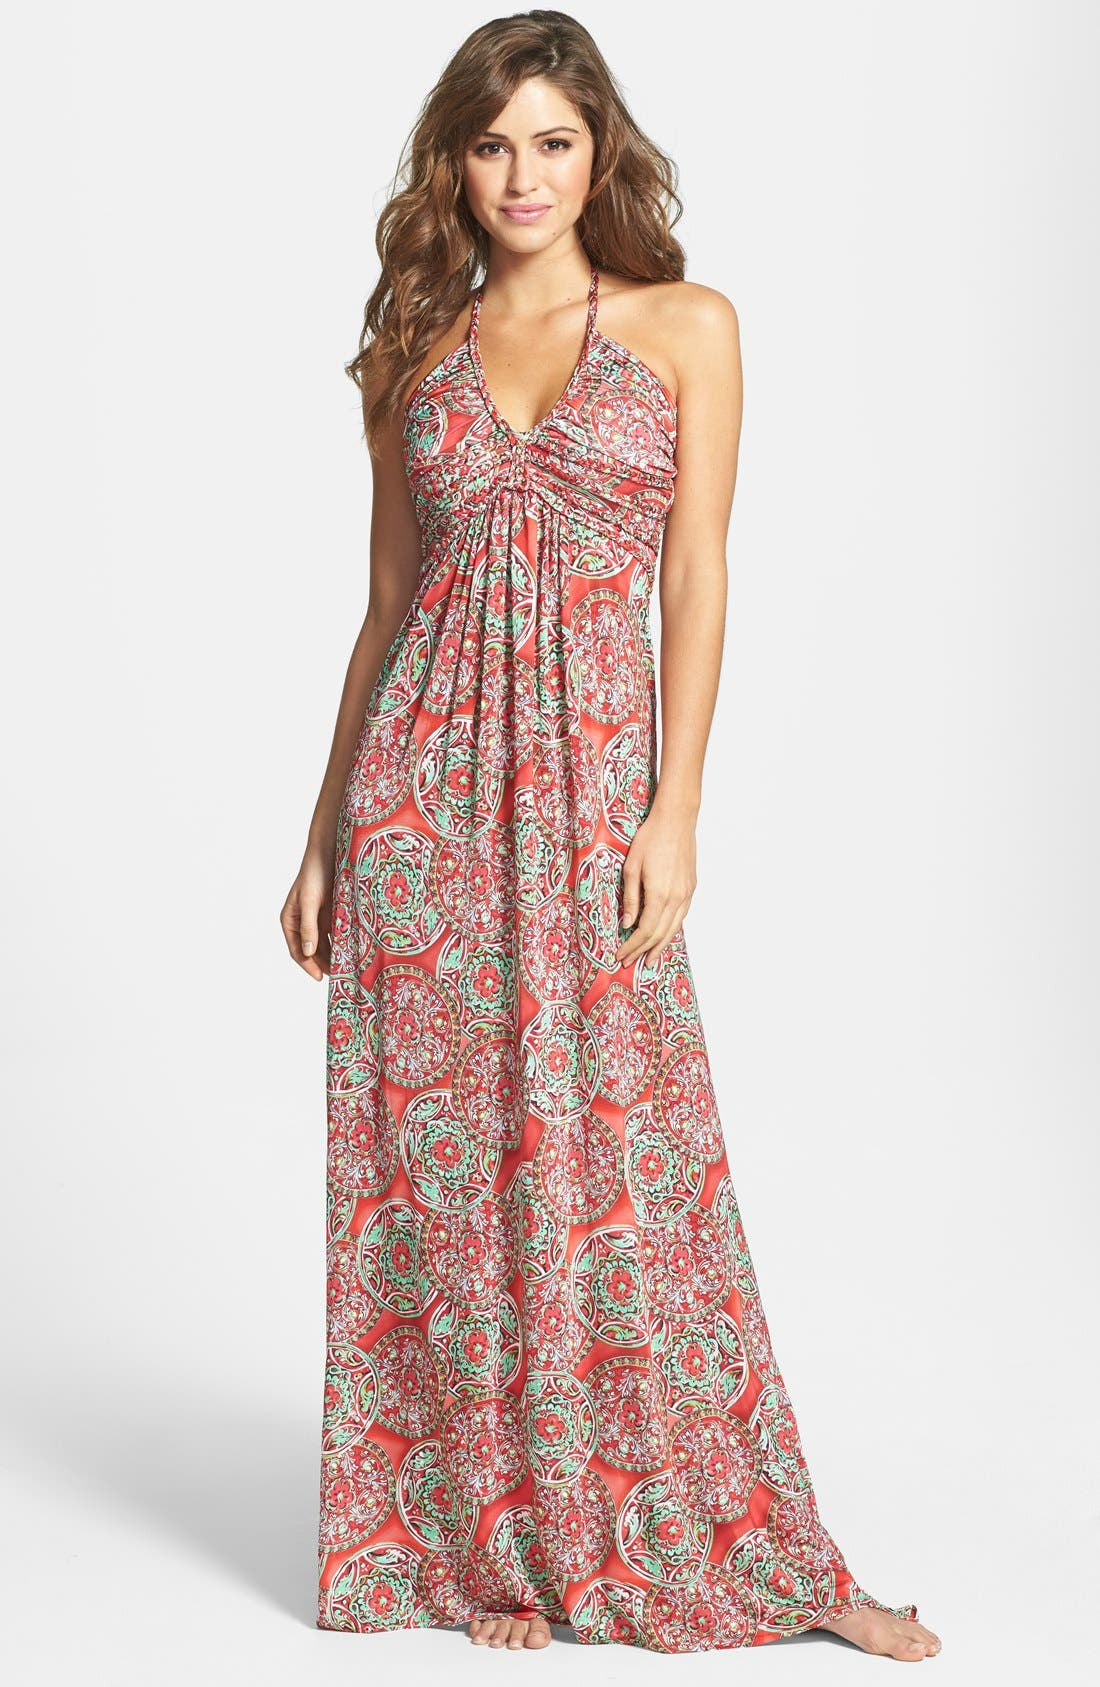 Main Image - Luli Fama 'Cocktail Hour' Braided Strap Maxi Dress